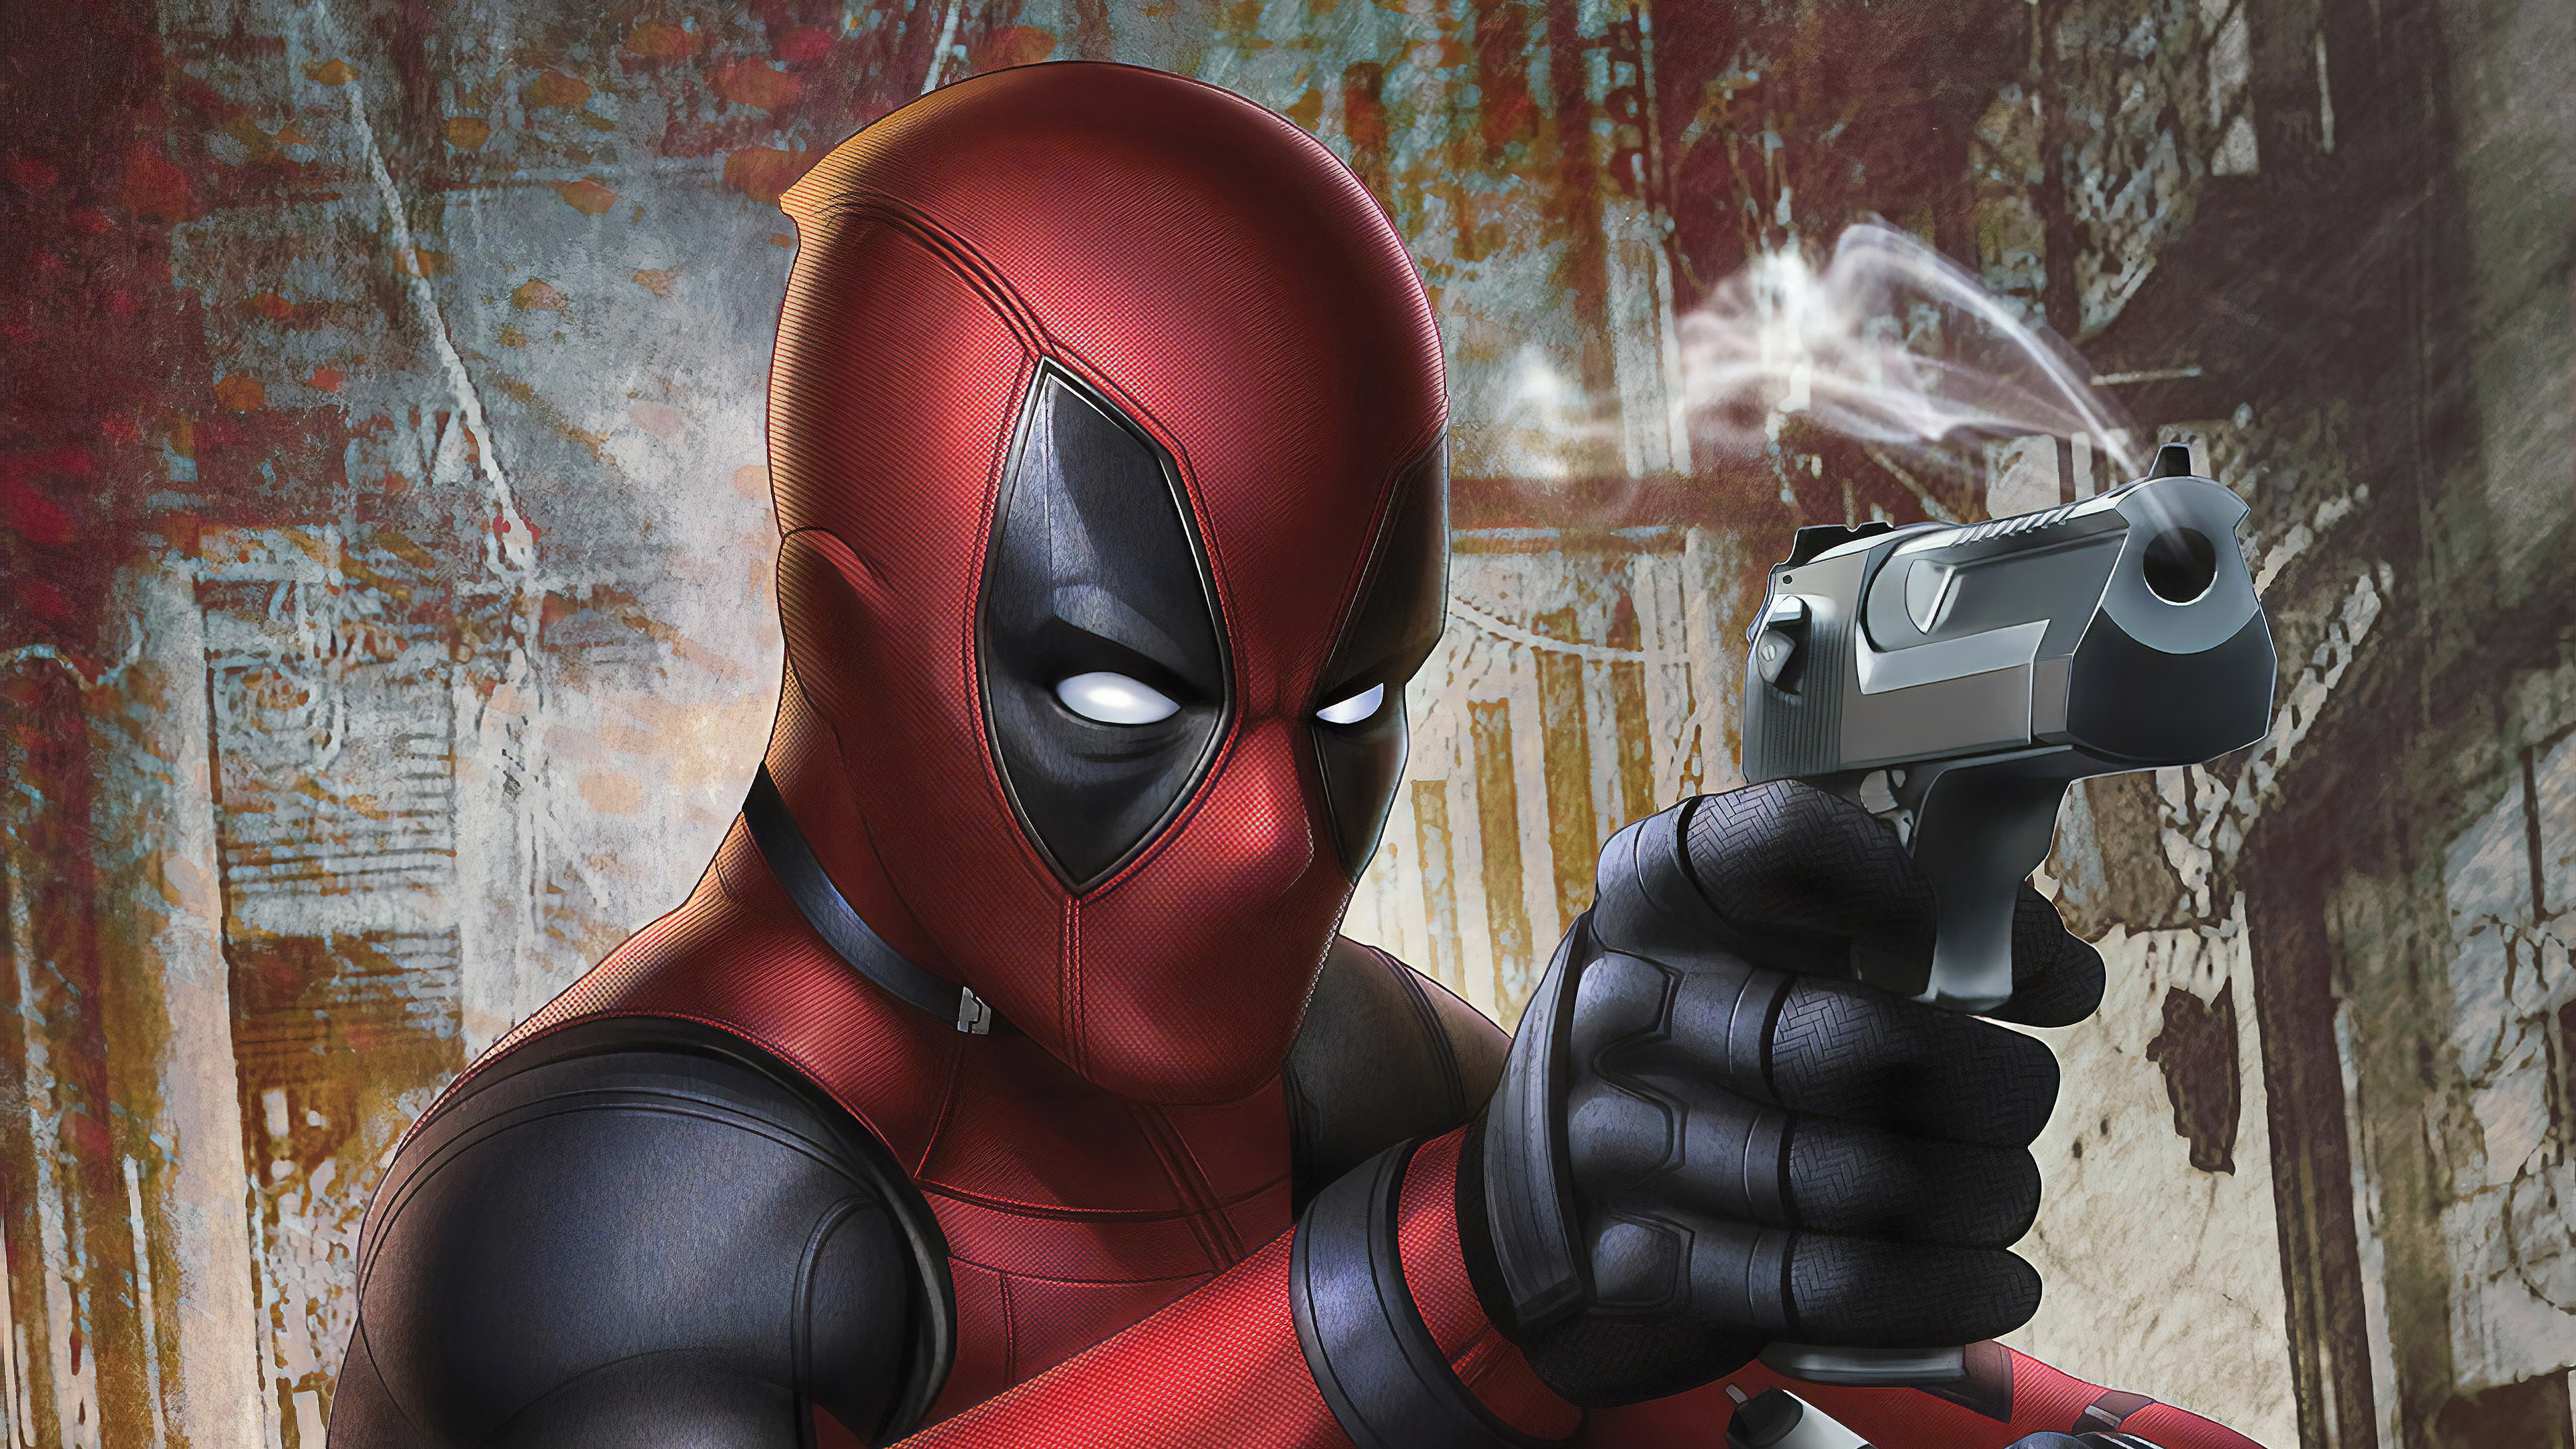 Wallpaper 4k Deadpool Gun 4k 4k Wallpapers Artwork